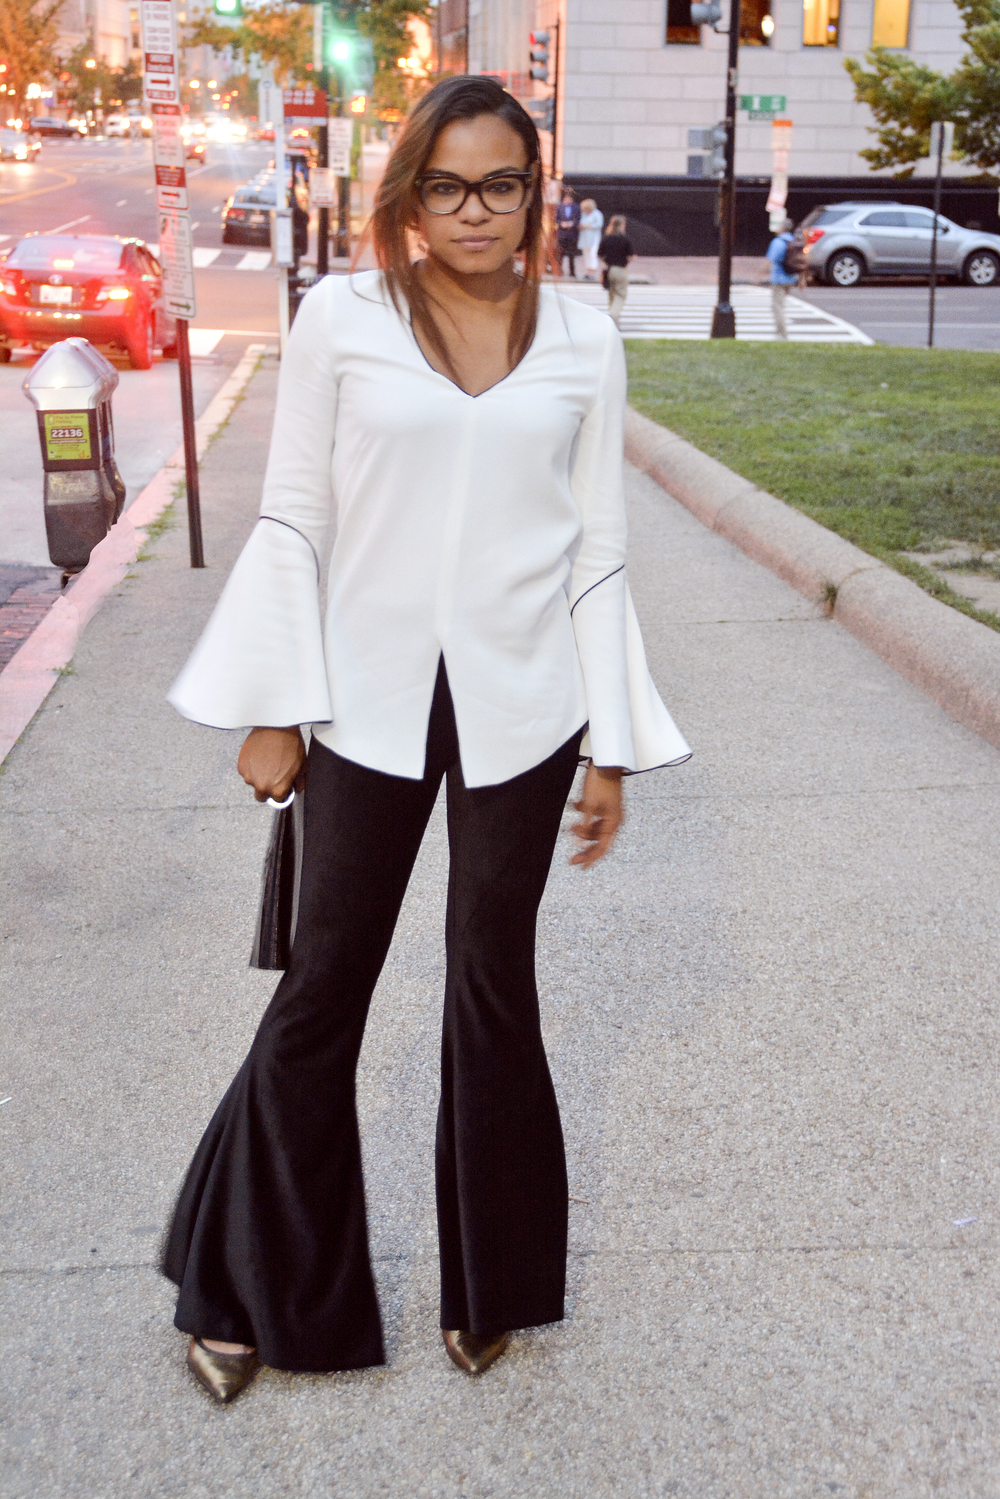 wearing: H&M pants, Derek Lam top, Giuseppe Zanotti heels, Tom Ford eyeglasses.